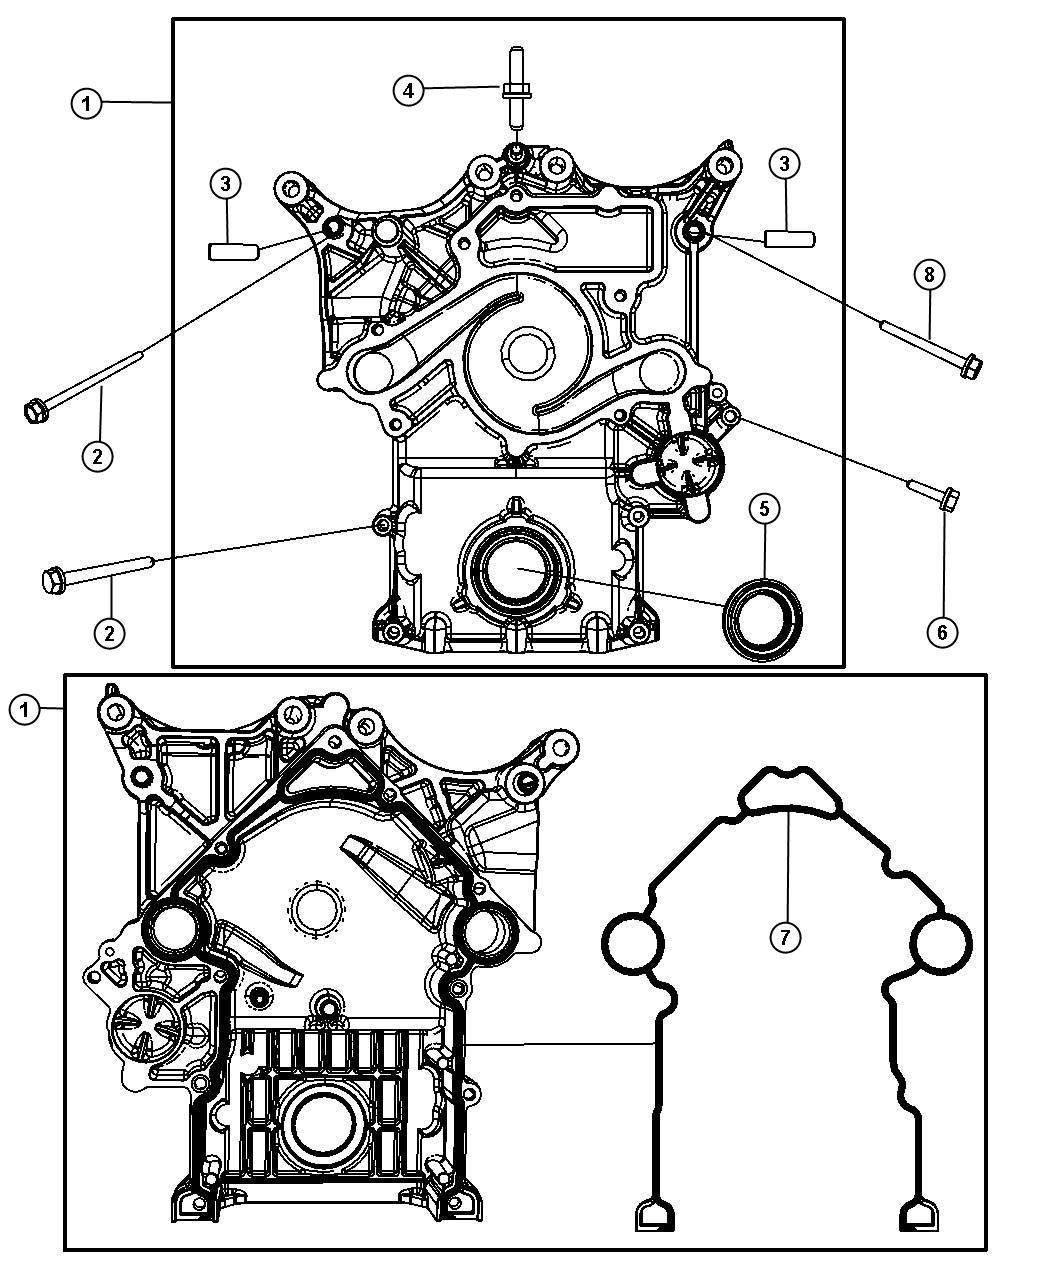 Wiring Diagram For 2010 Dodge Ram 1500 Hemi